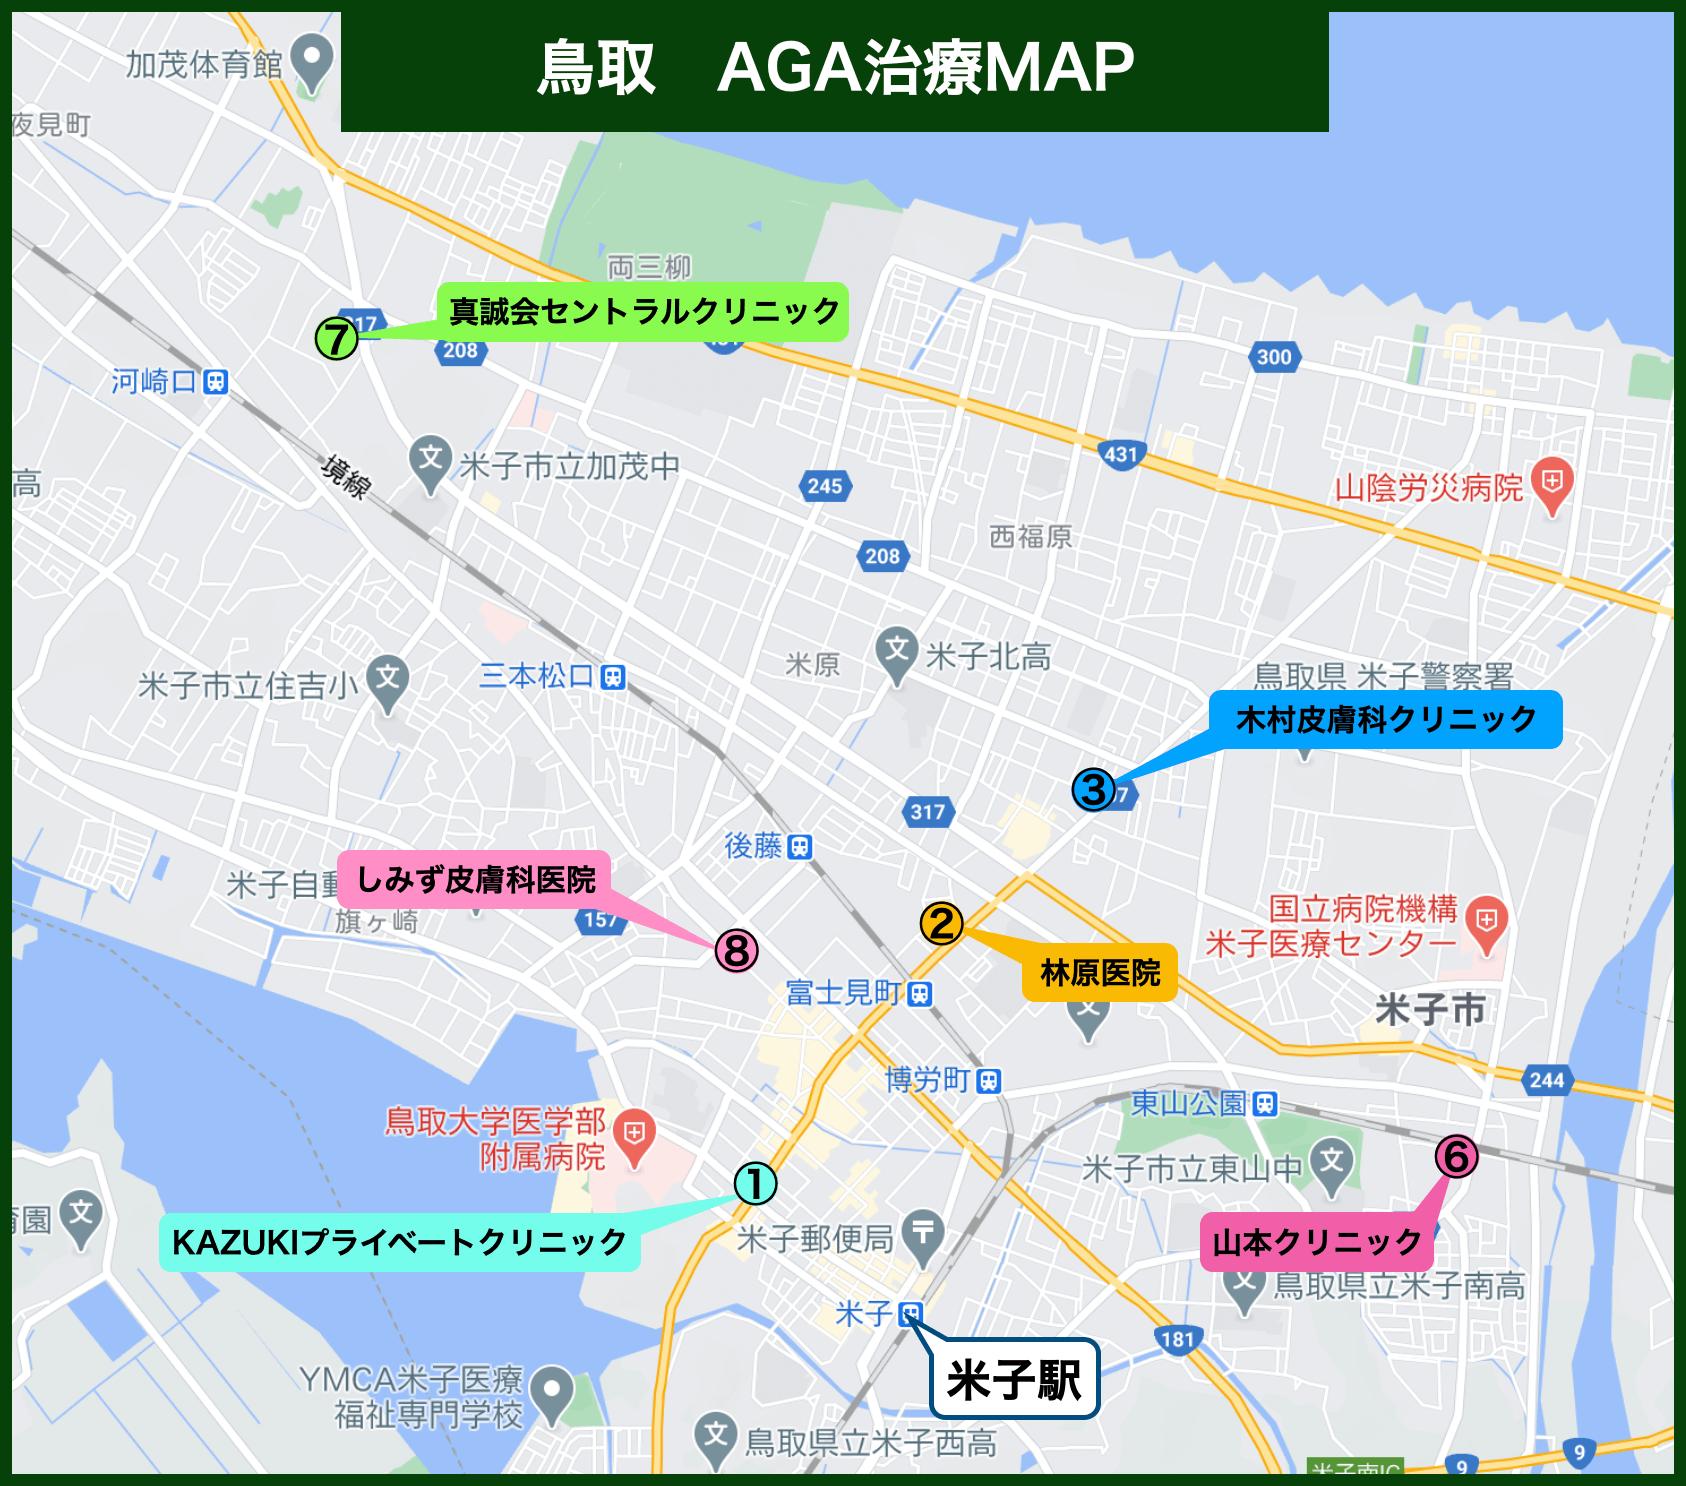 鳥取AGA治療MAP